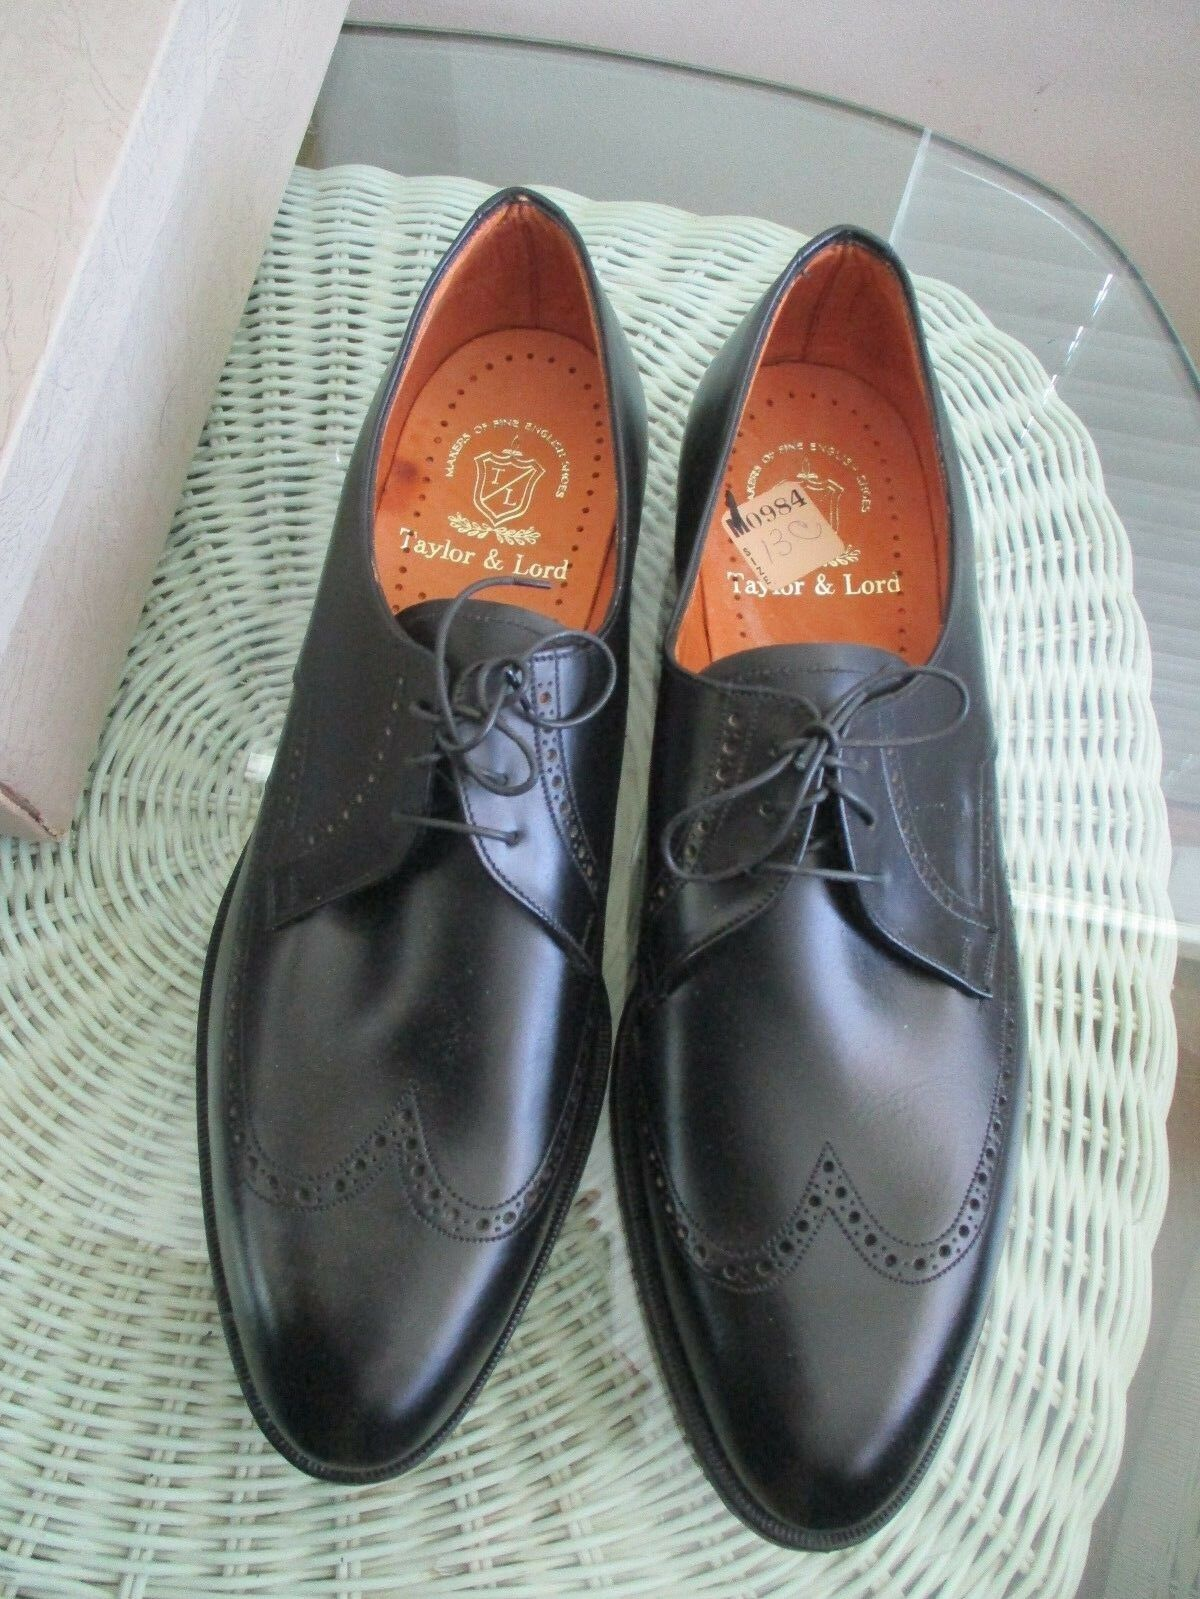 NEW Vintage Taylor & Lord Leather Wingtip Saddle Oxford nero sz 13 C England